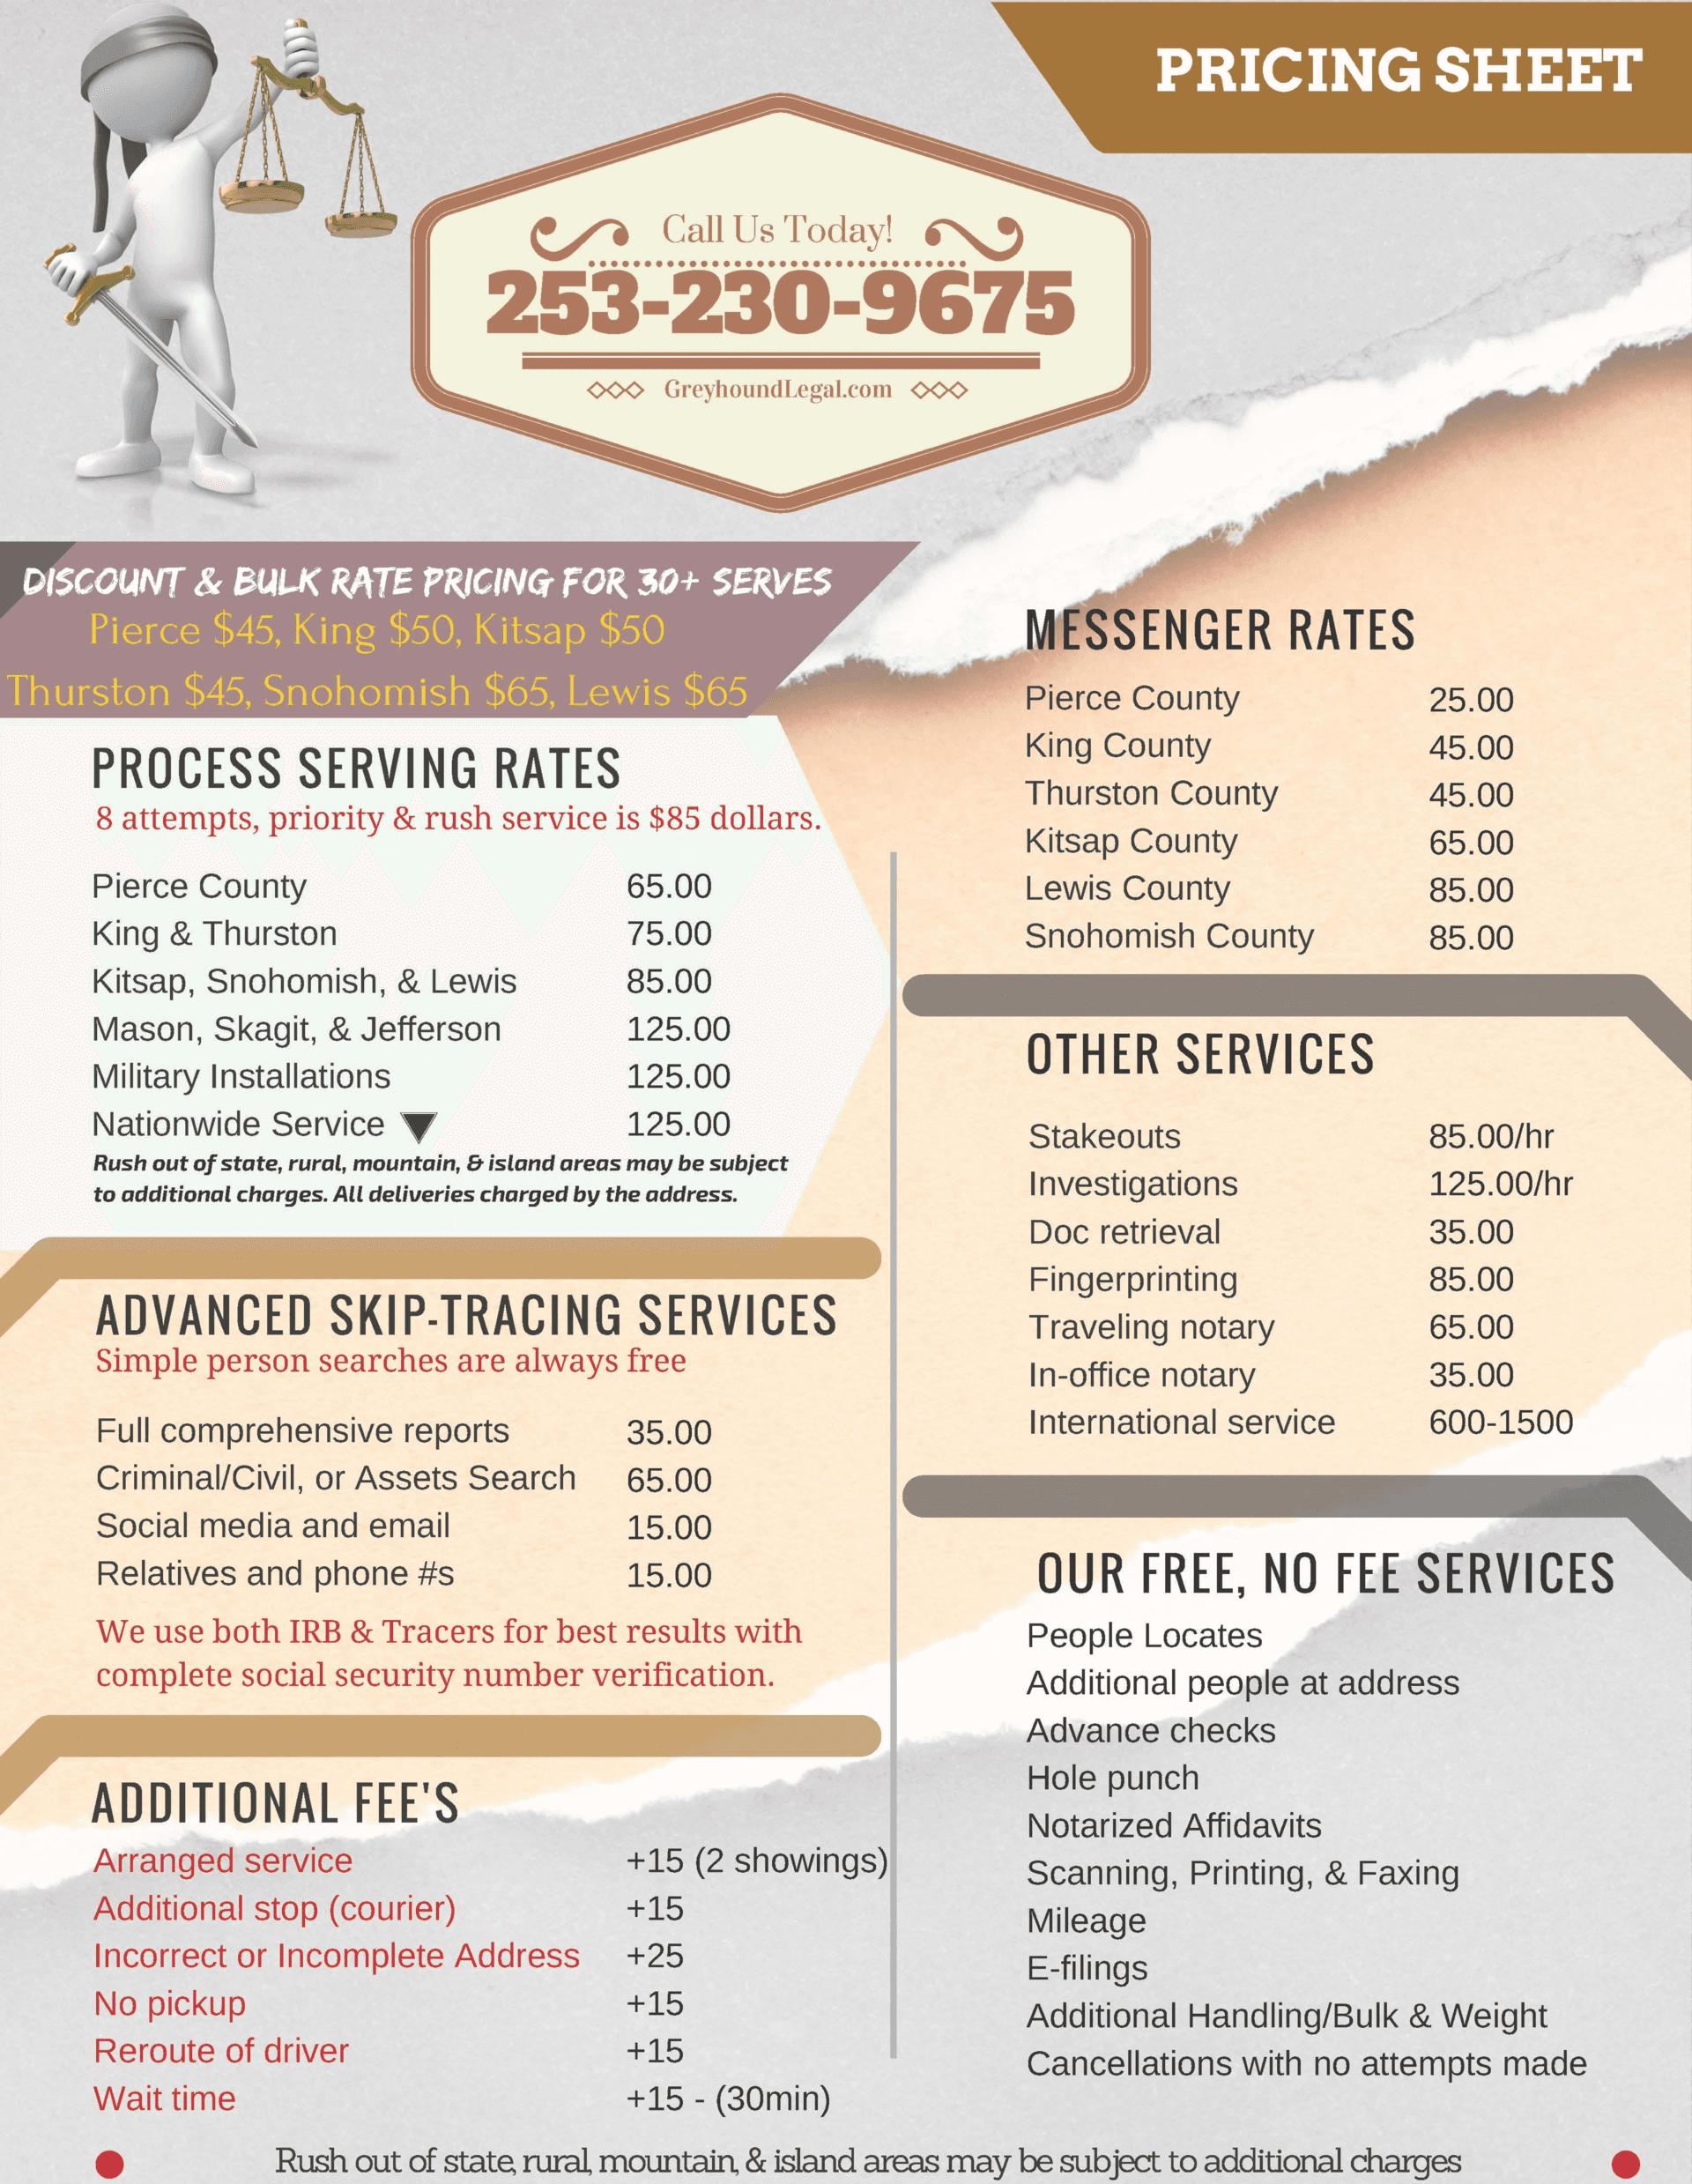 Process Serving Price Sheet (GreyhoundLeagal.com